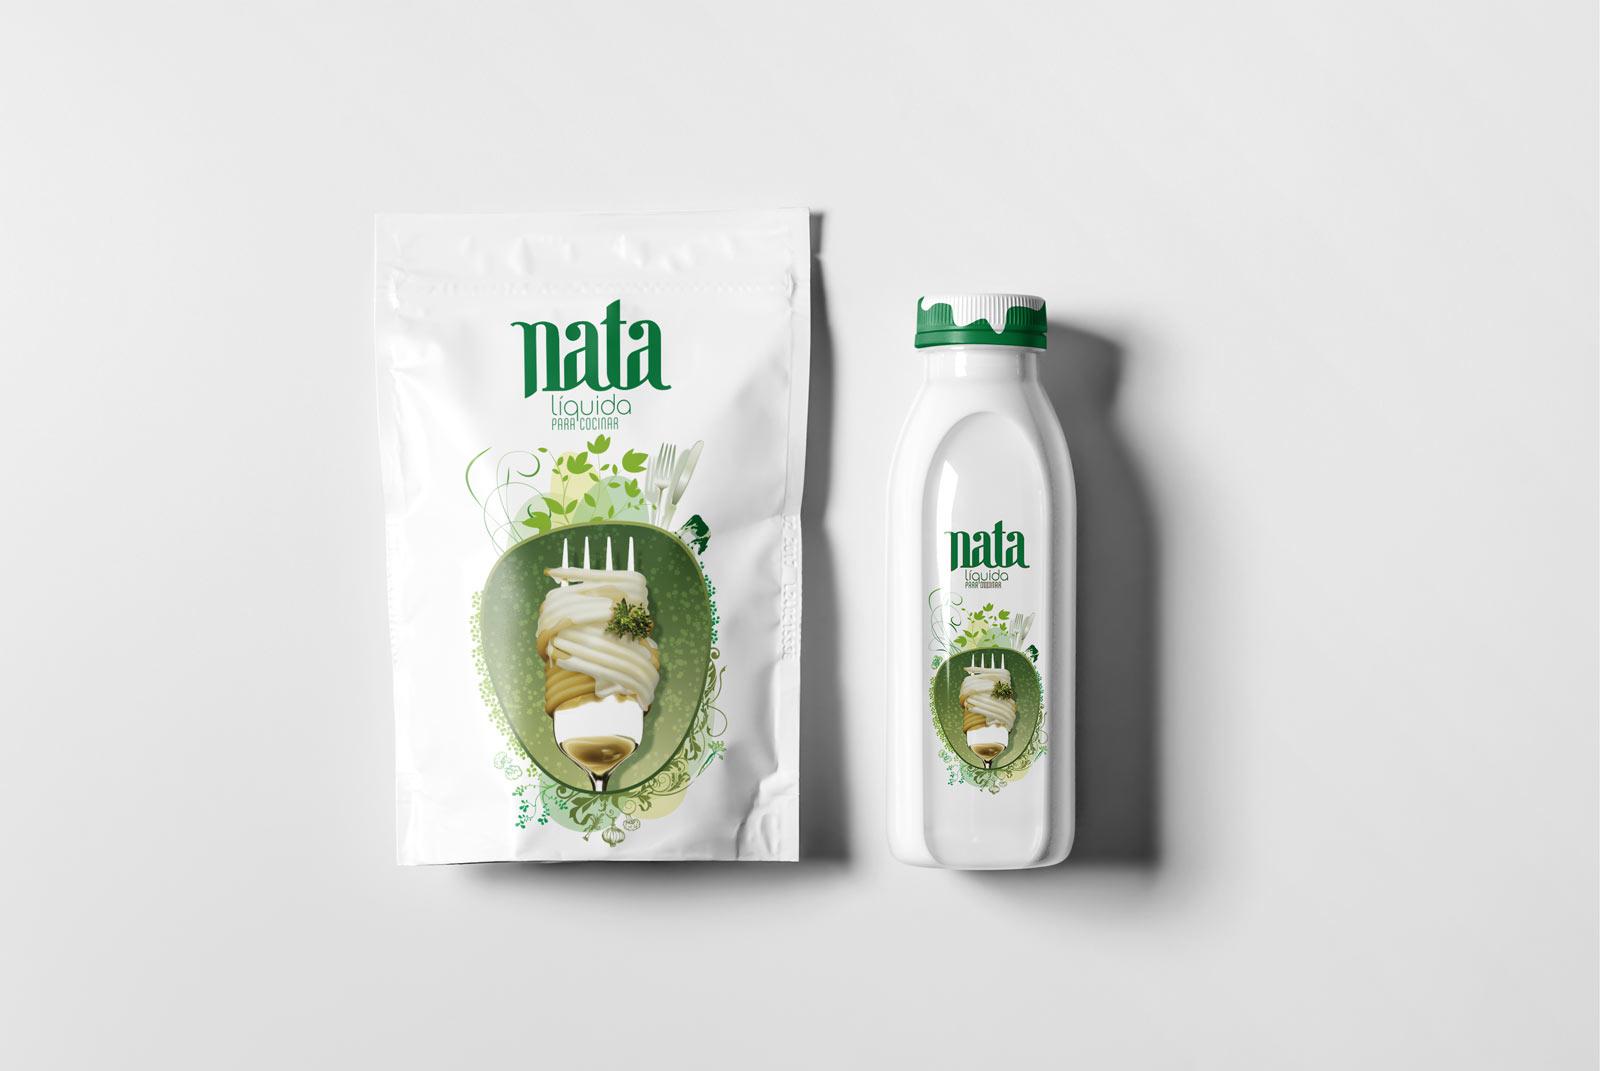 Froiz-nata-packaging-08